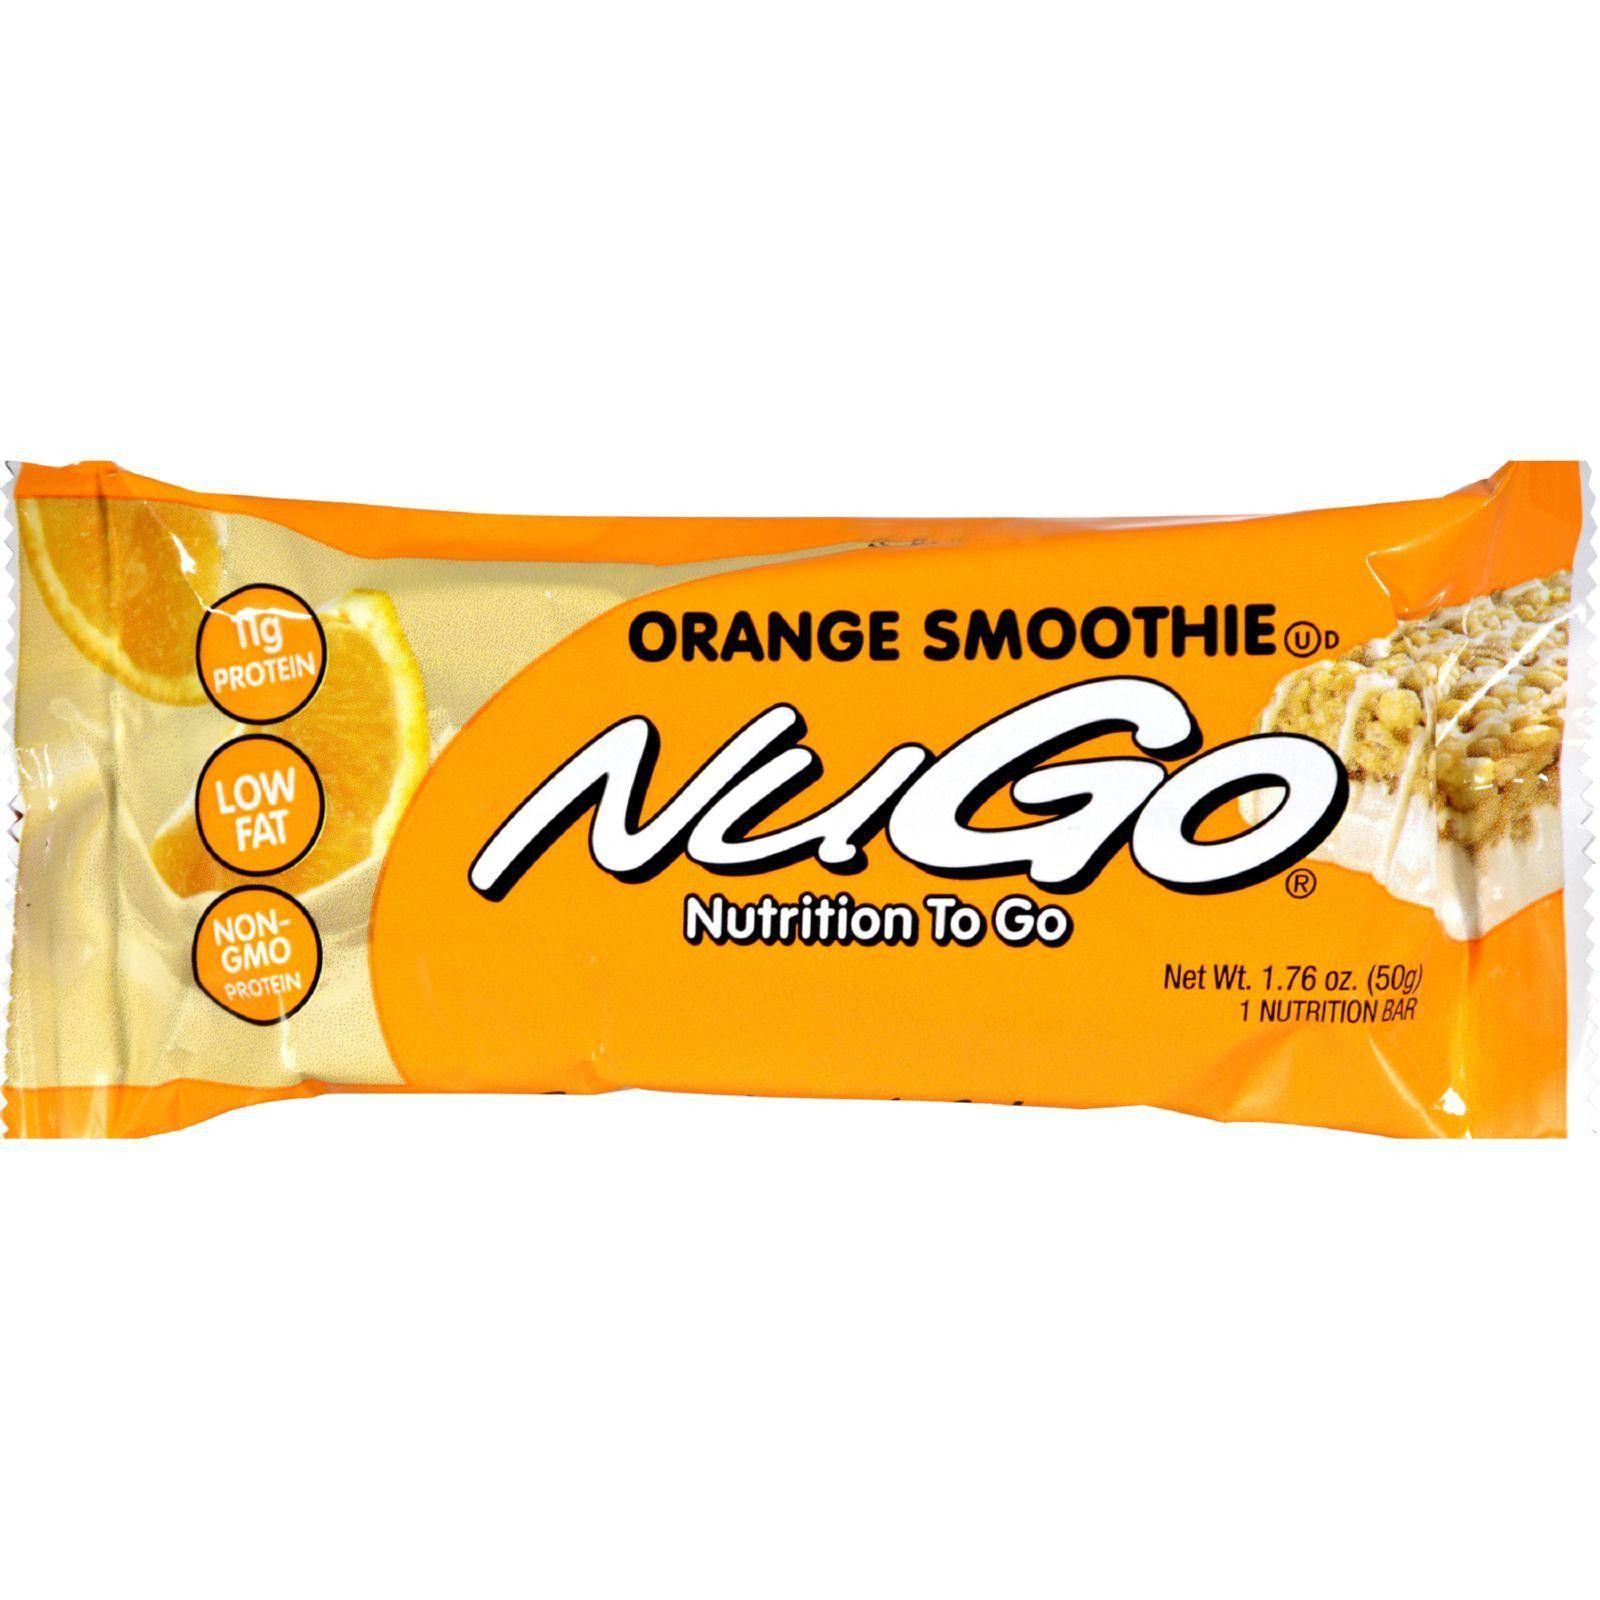 Nugo Nutrition Bar